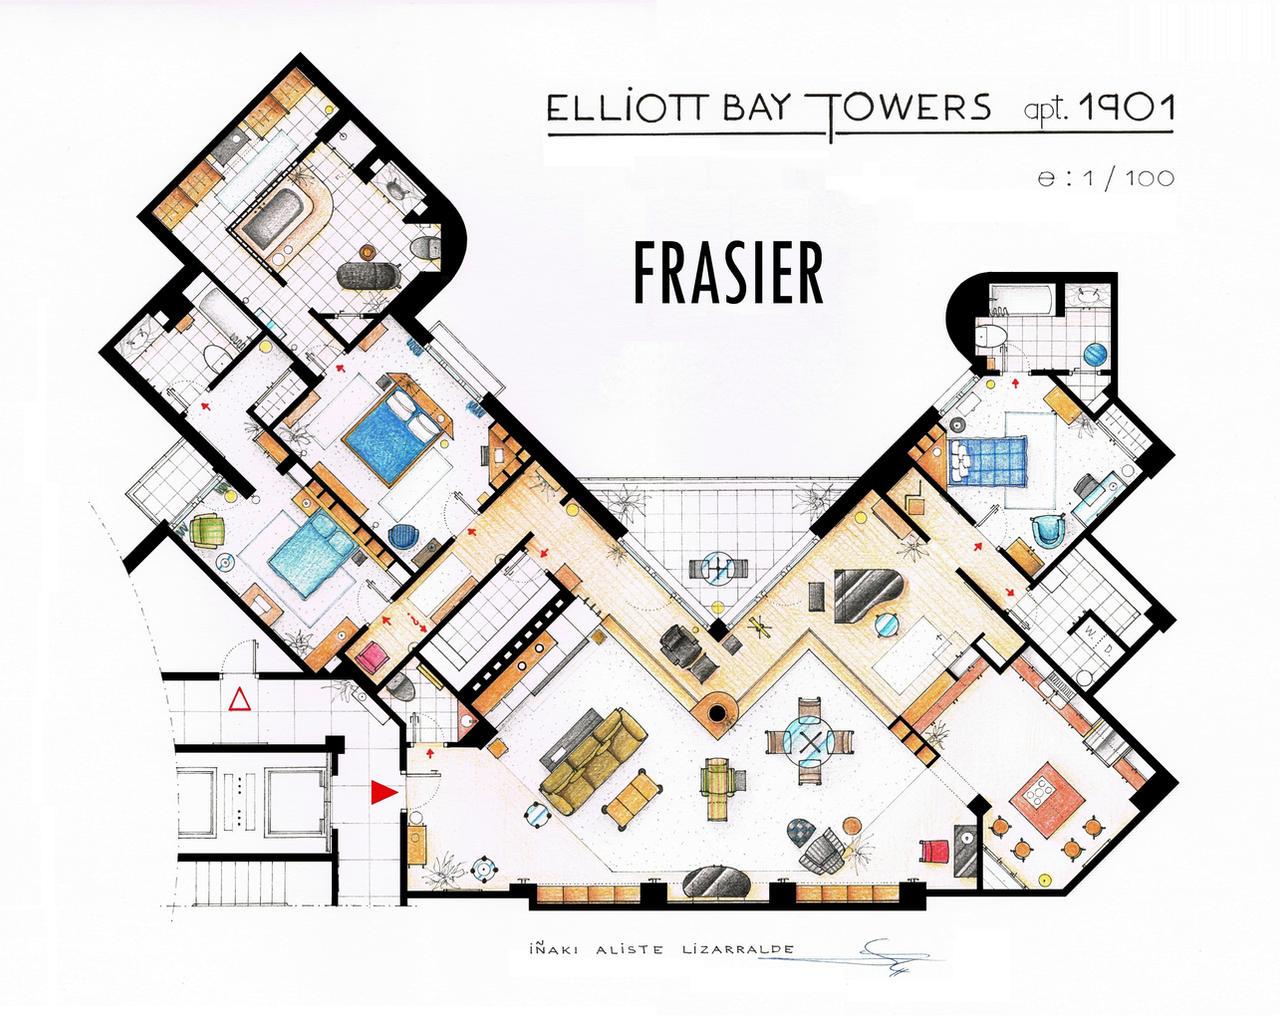 Frasier's Apartment Floorplan - Old version